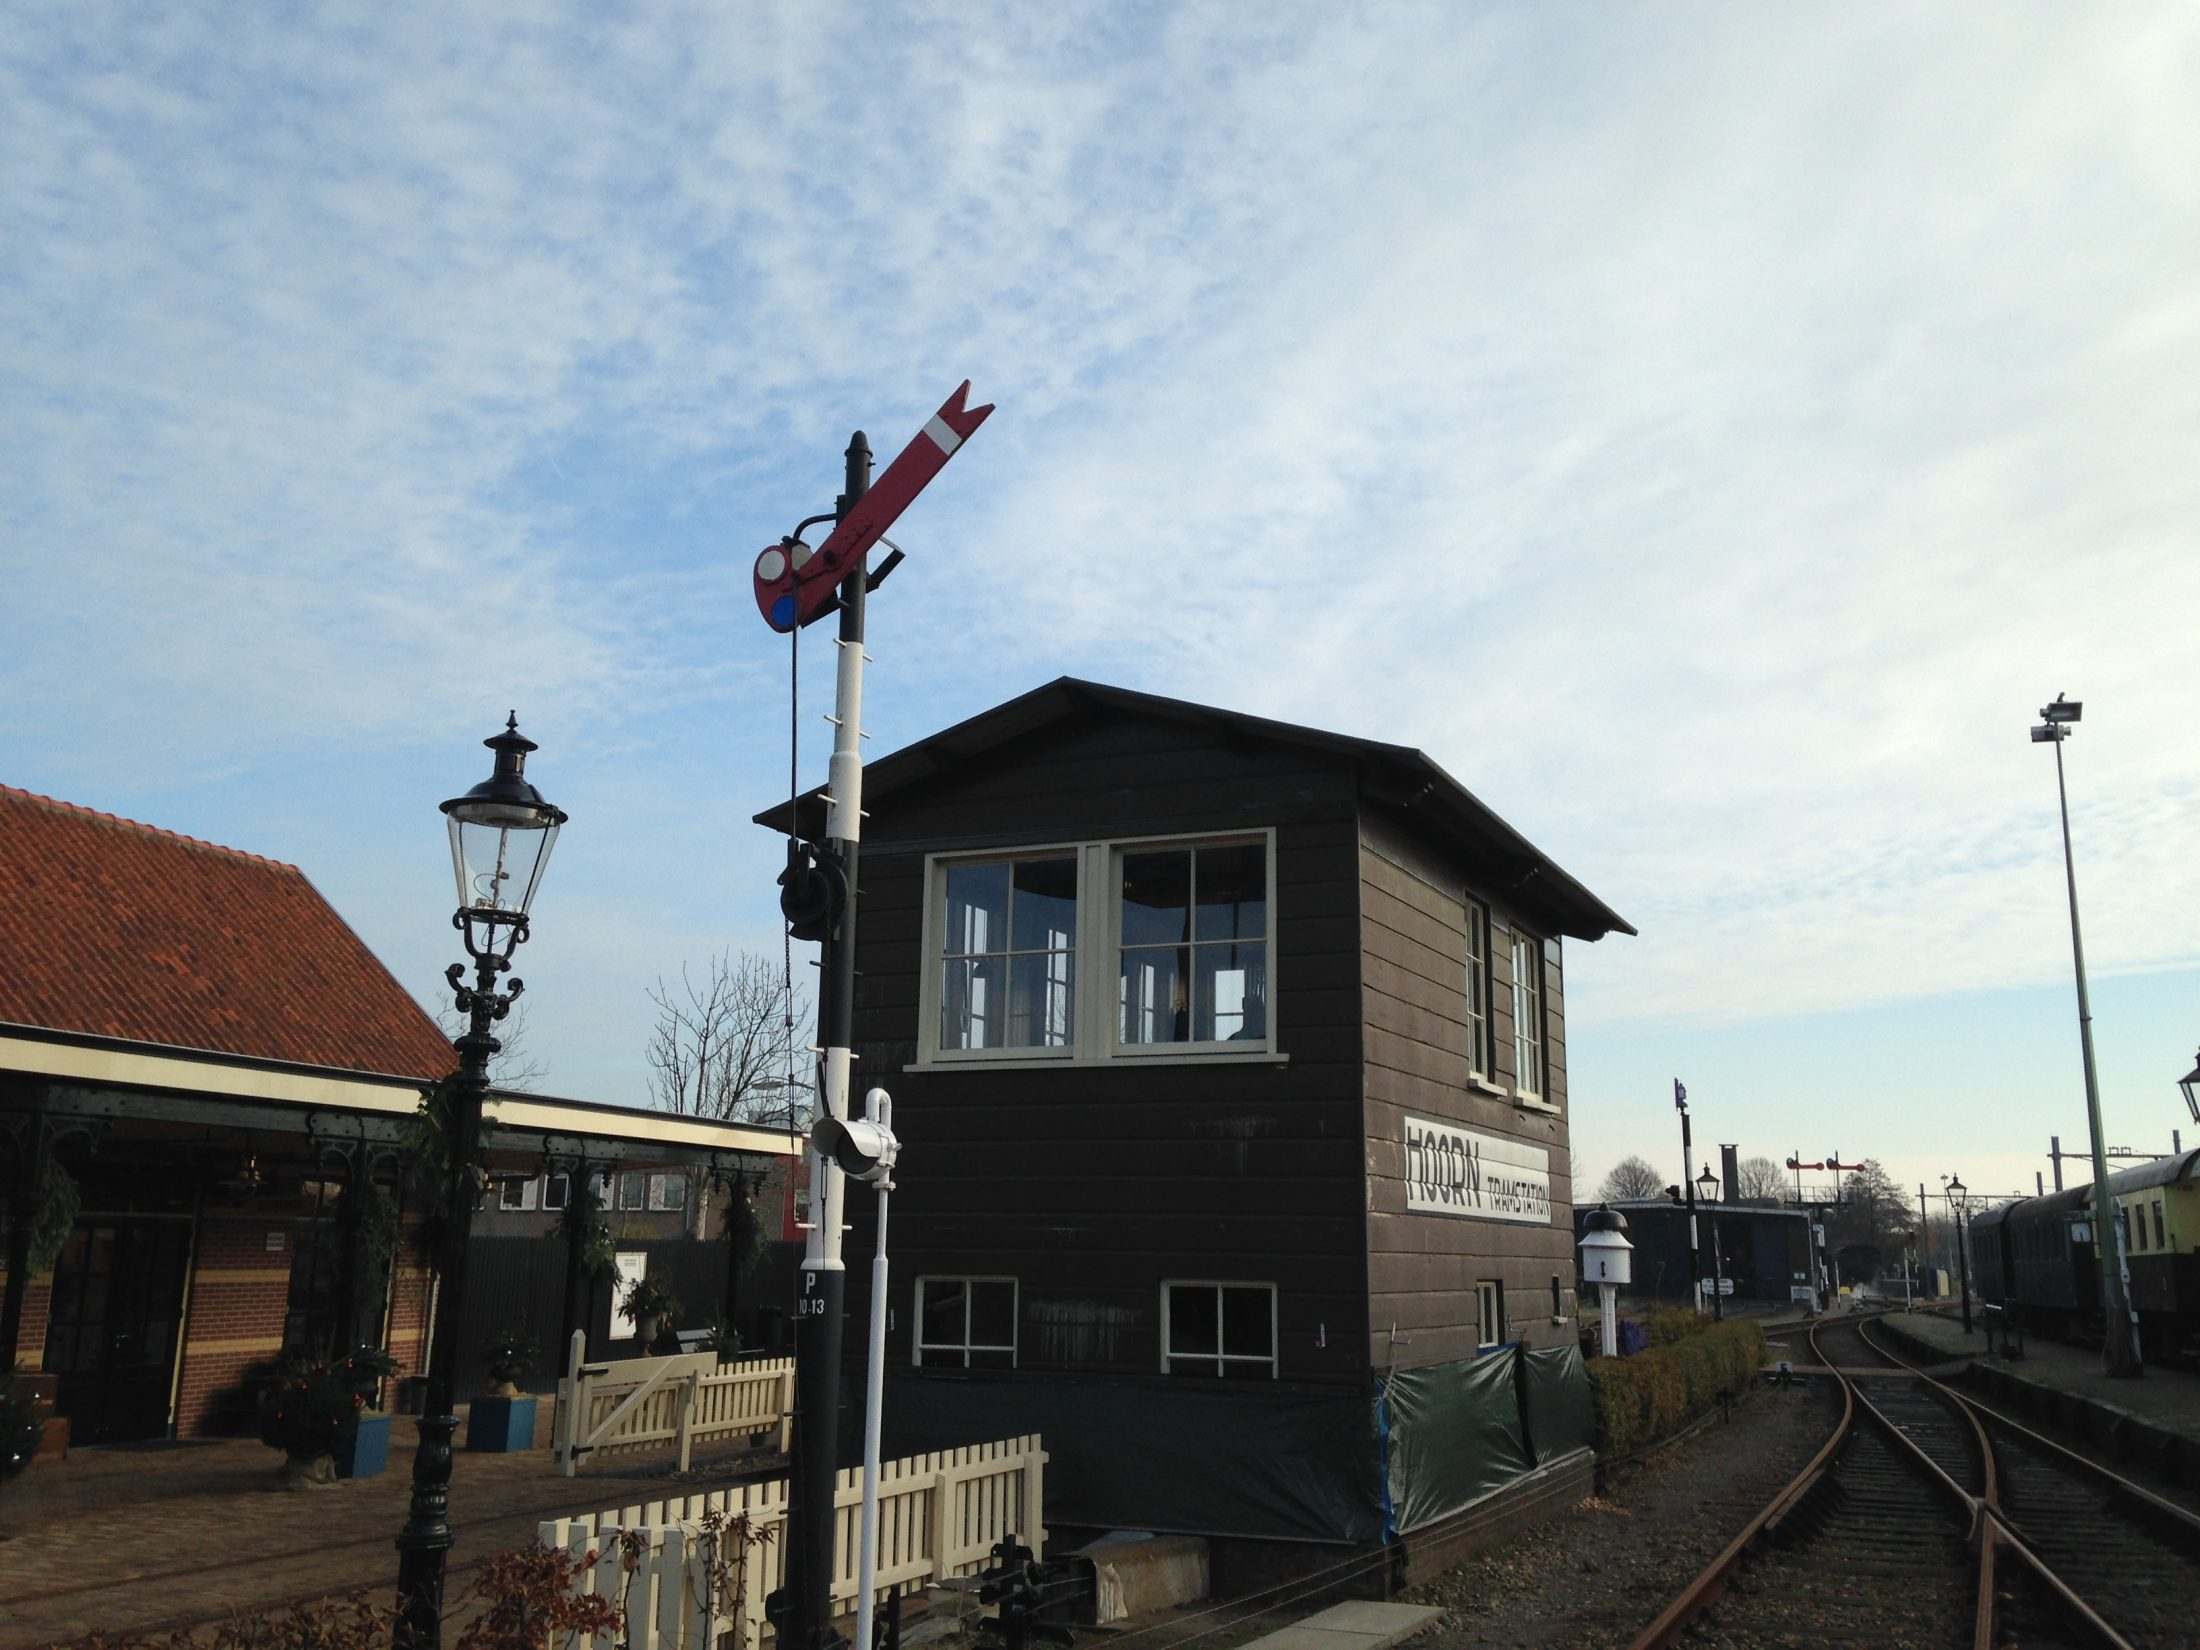 Seinhuis Hoorn